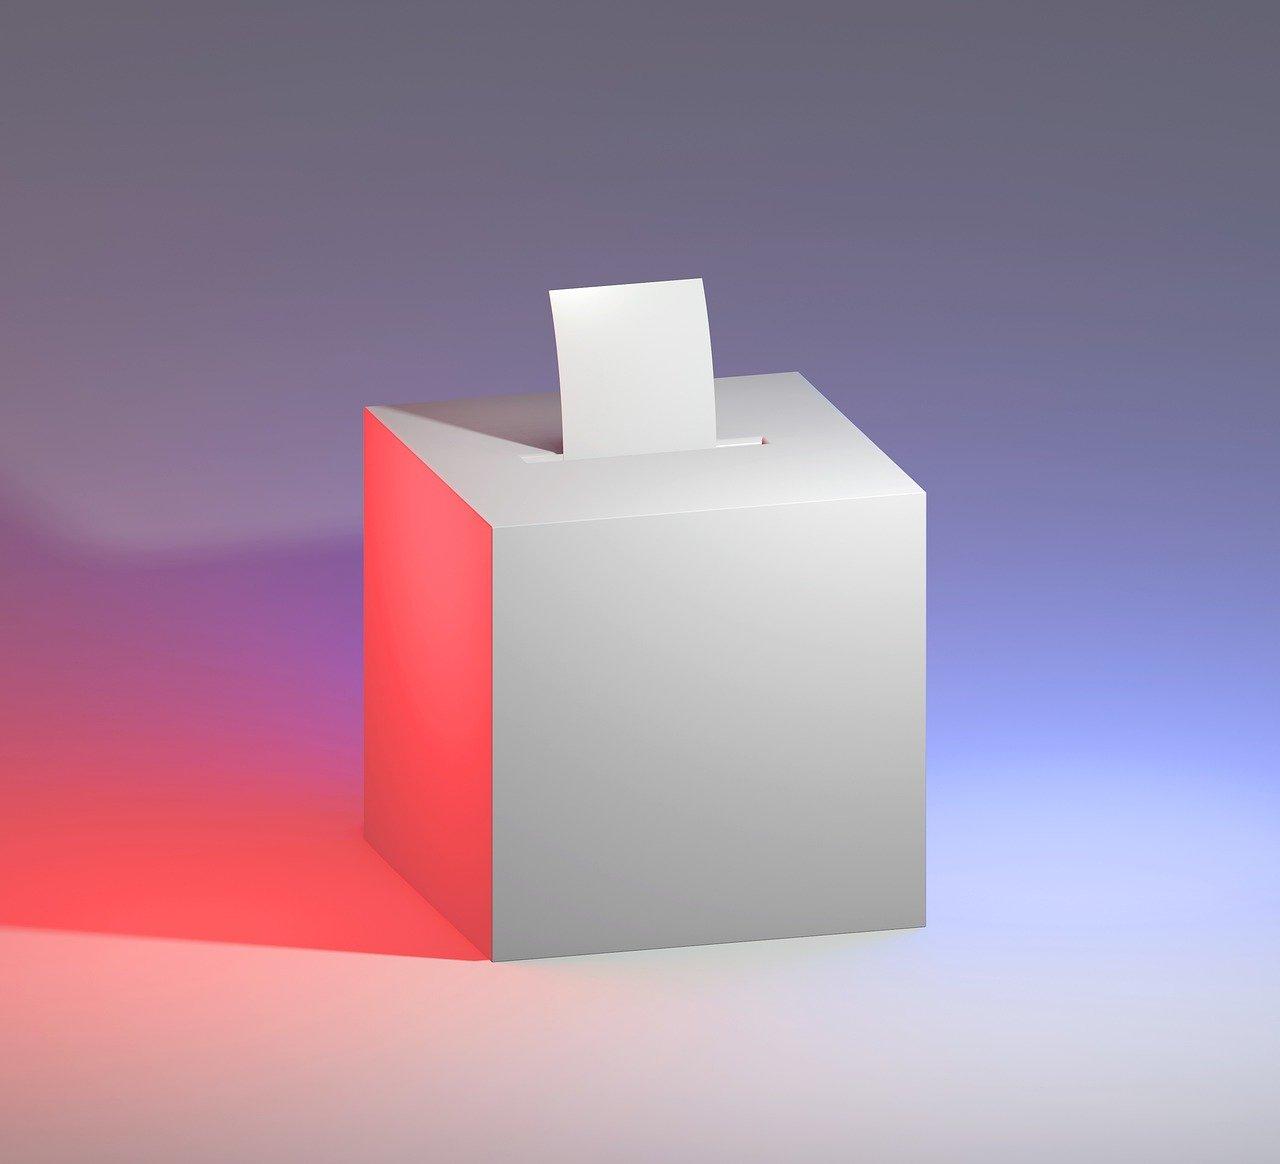 Presidenciais: Como votar antecipadamente a 17 de Janeiro?